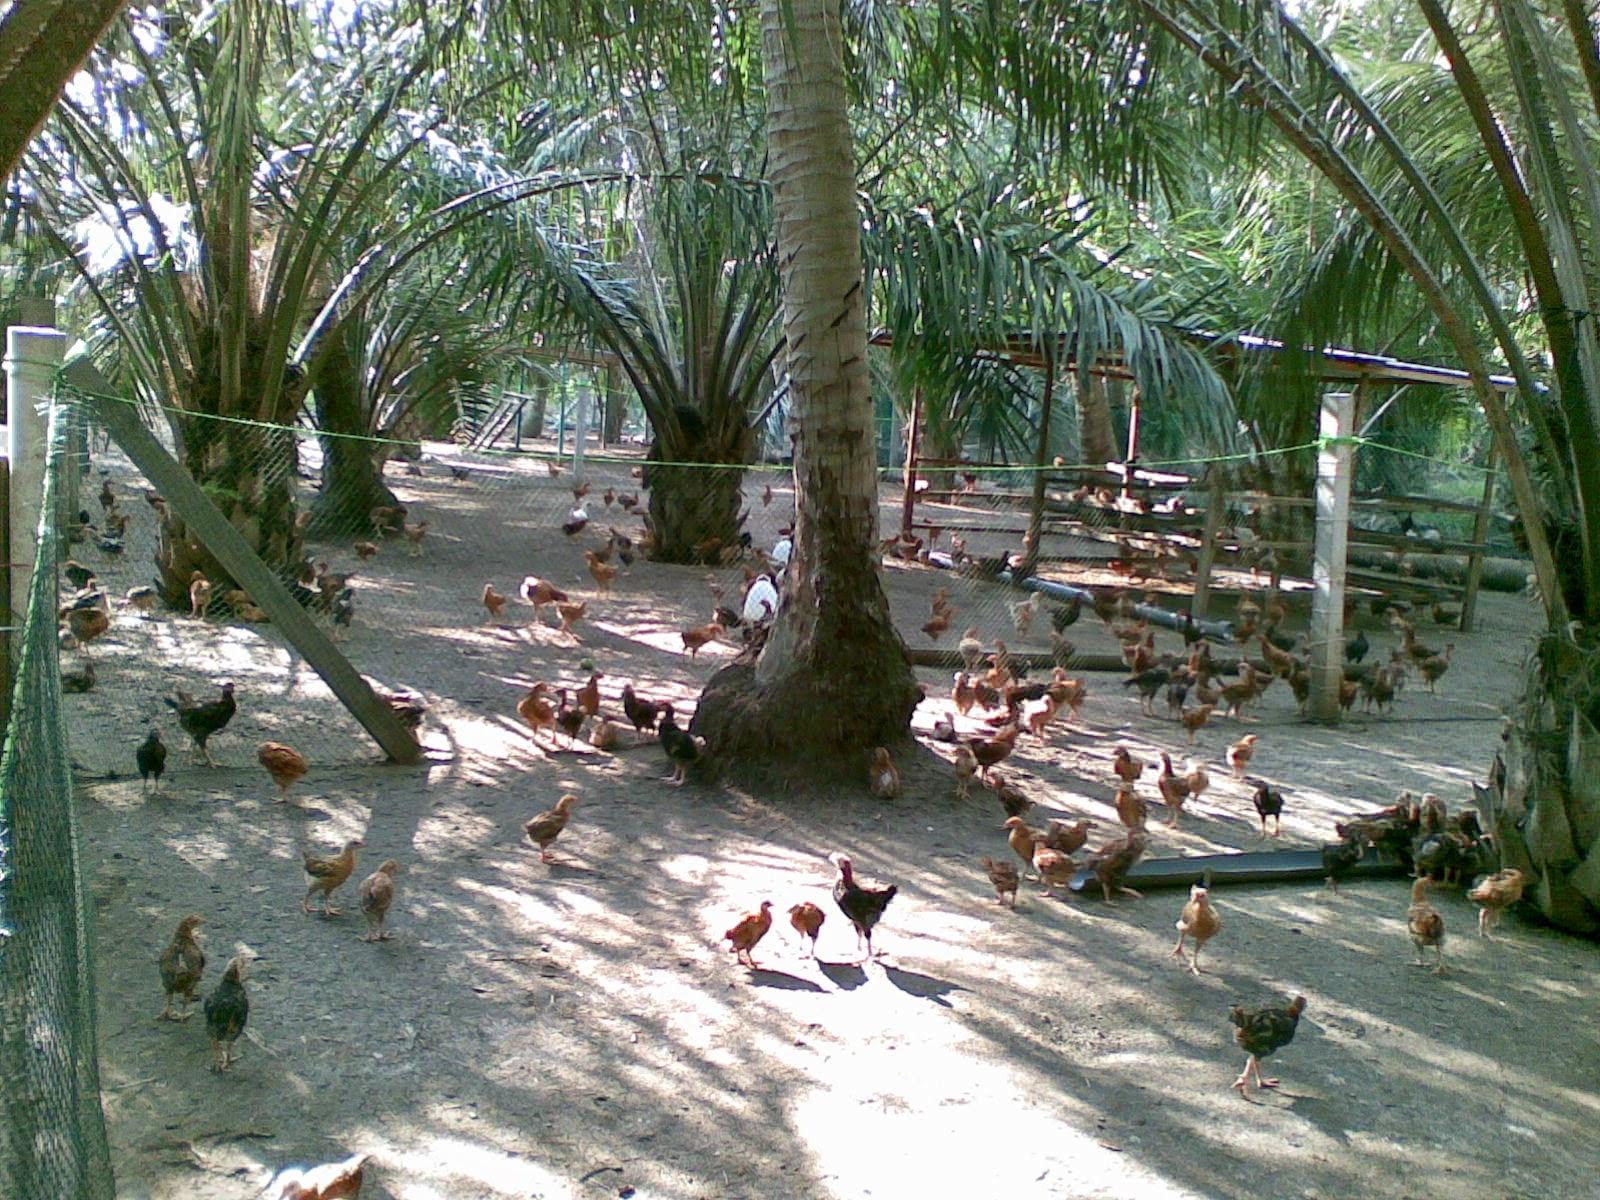 Resiko Ternak Ayam Secara Umbaran - Bisnis Ayam Kampung